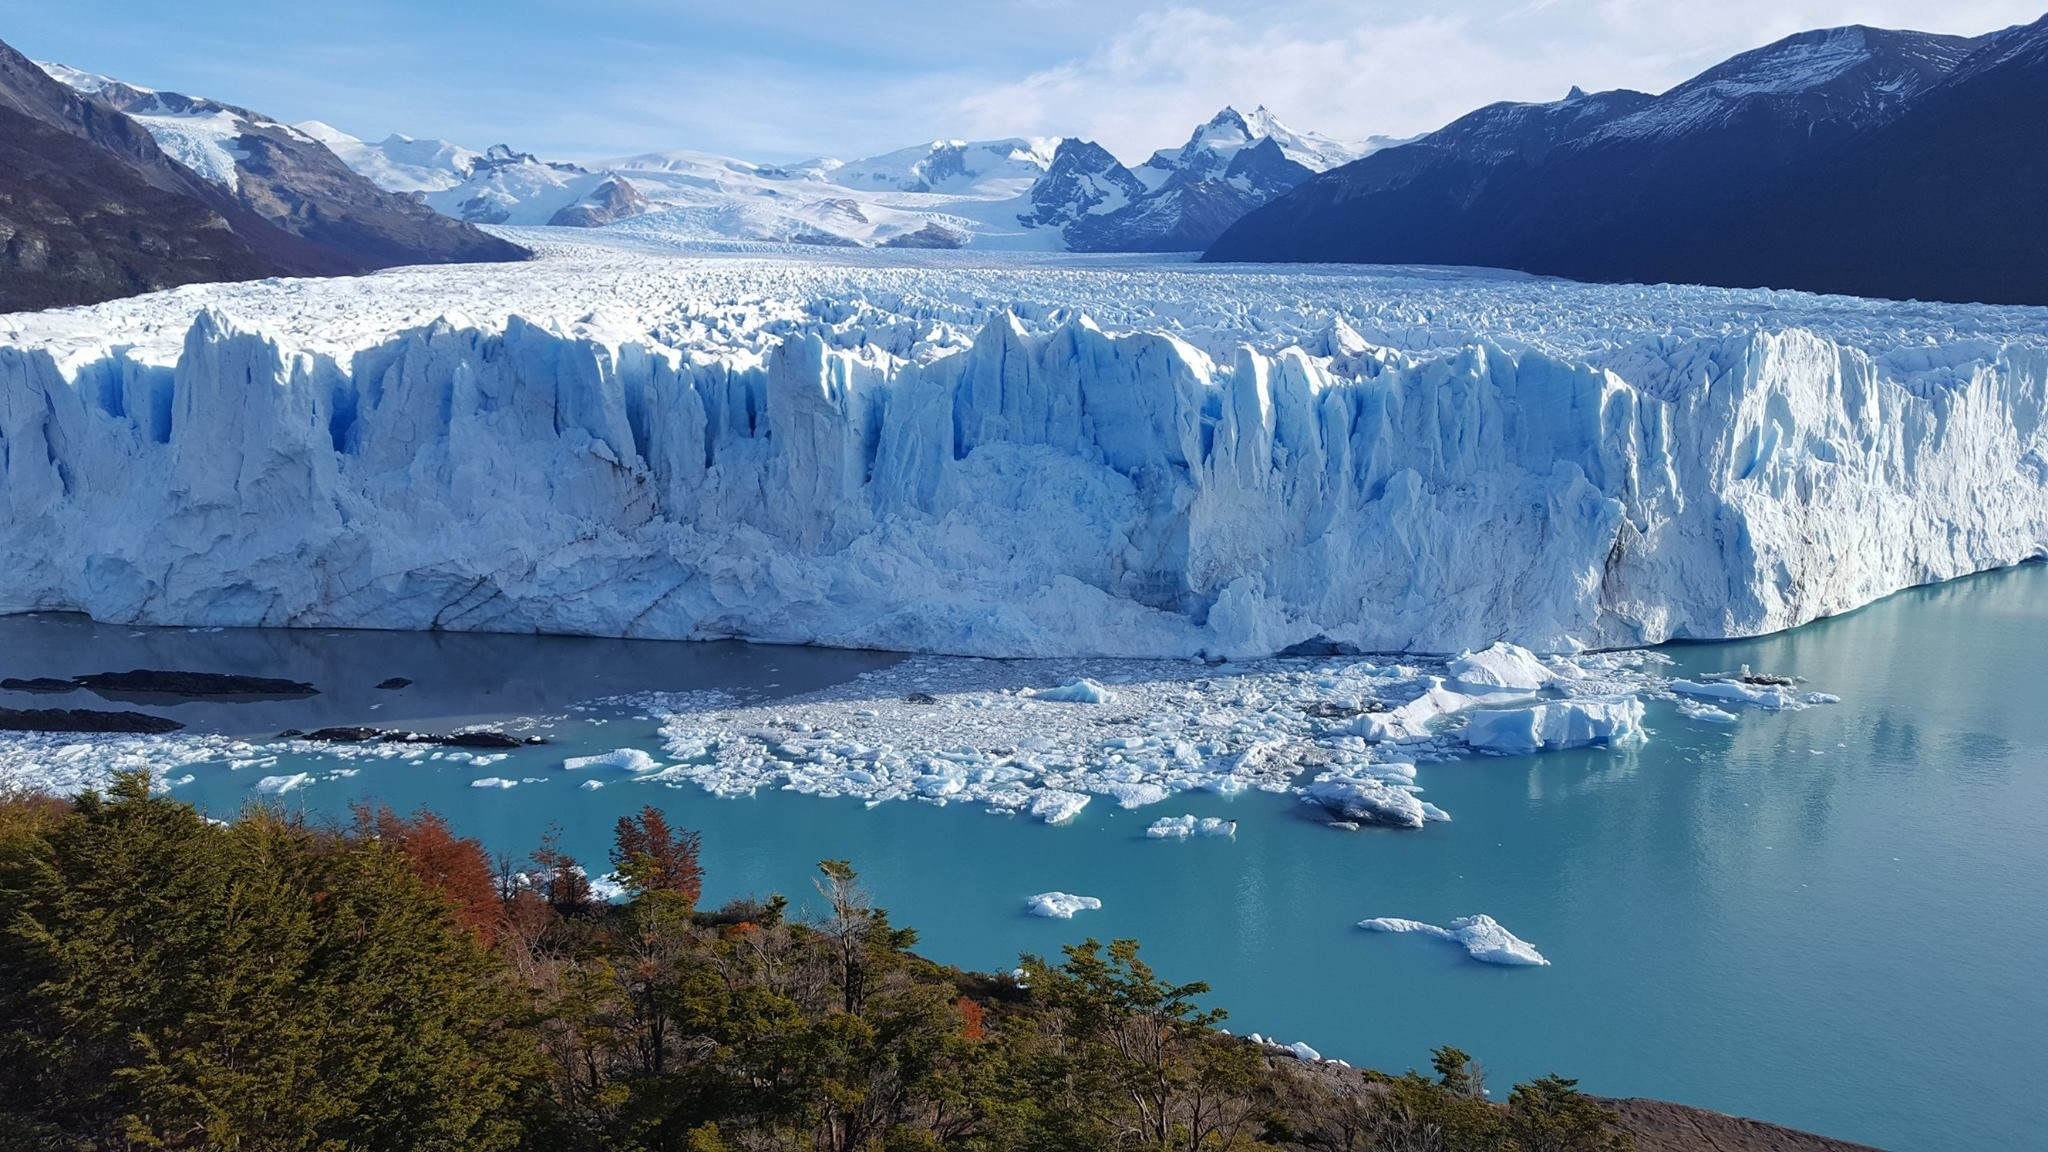 Sfeerimpressie Rondreis: Meren en gletsjers van Patagonië